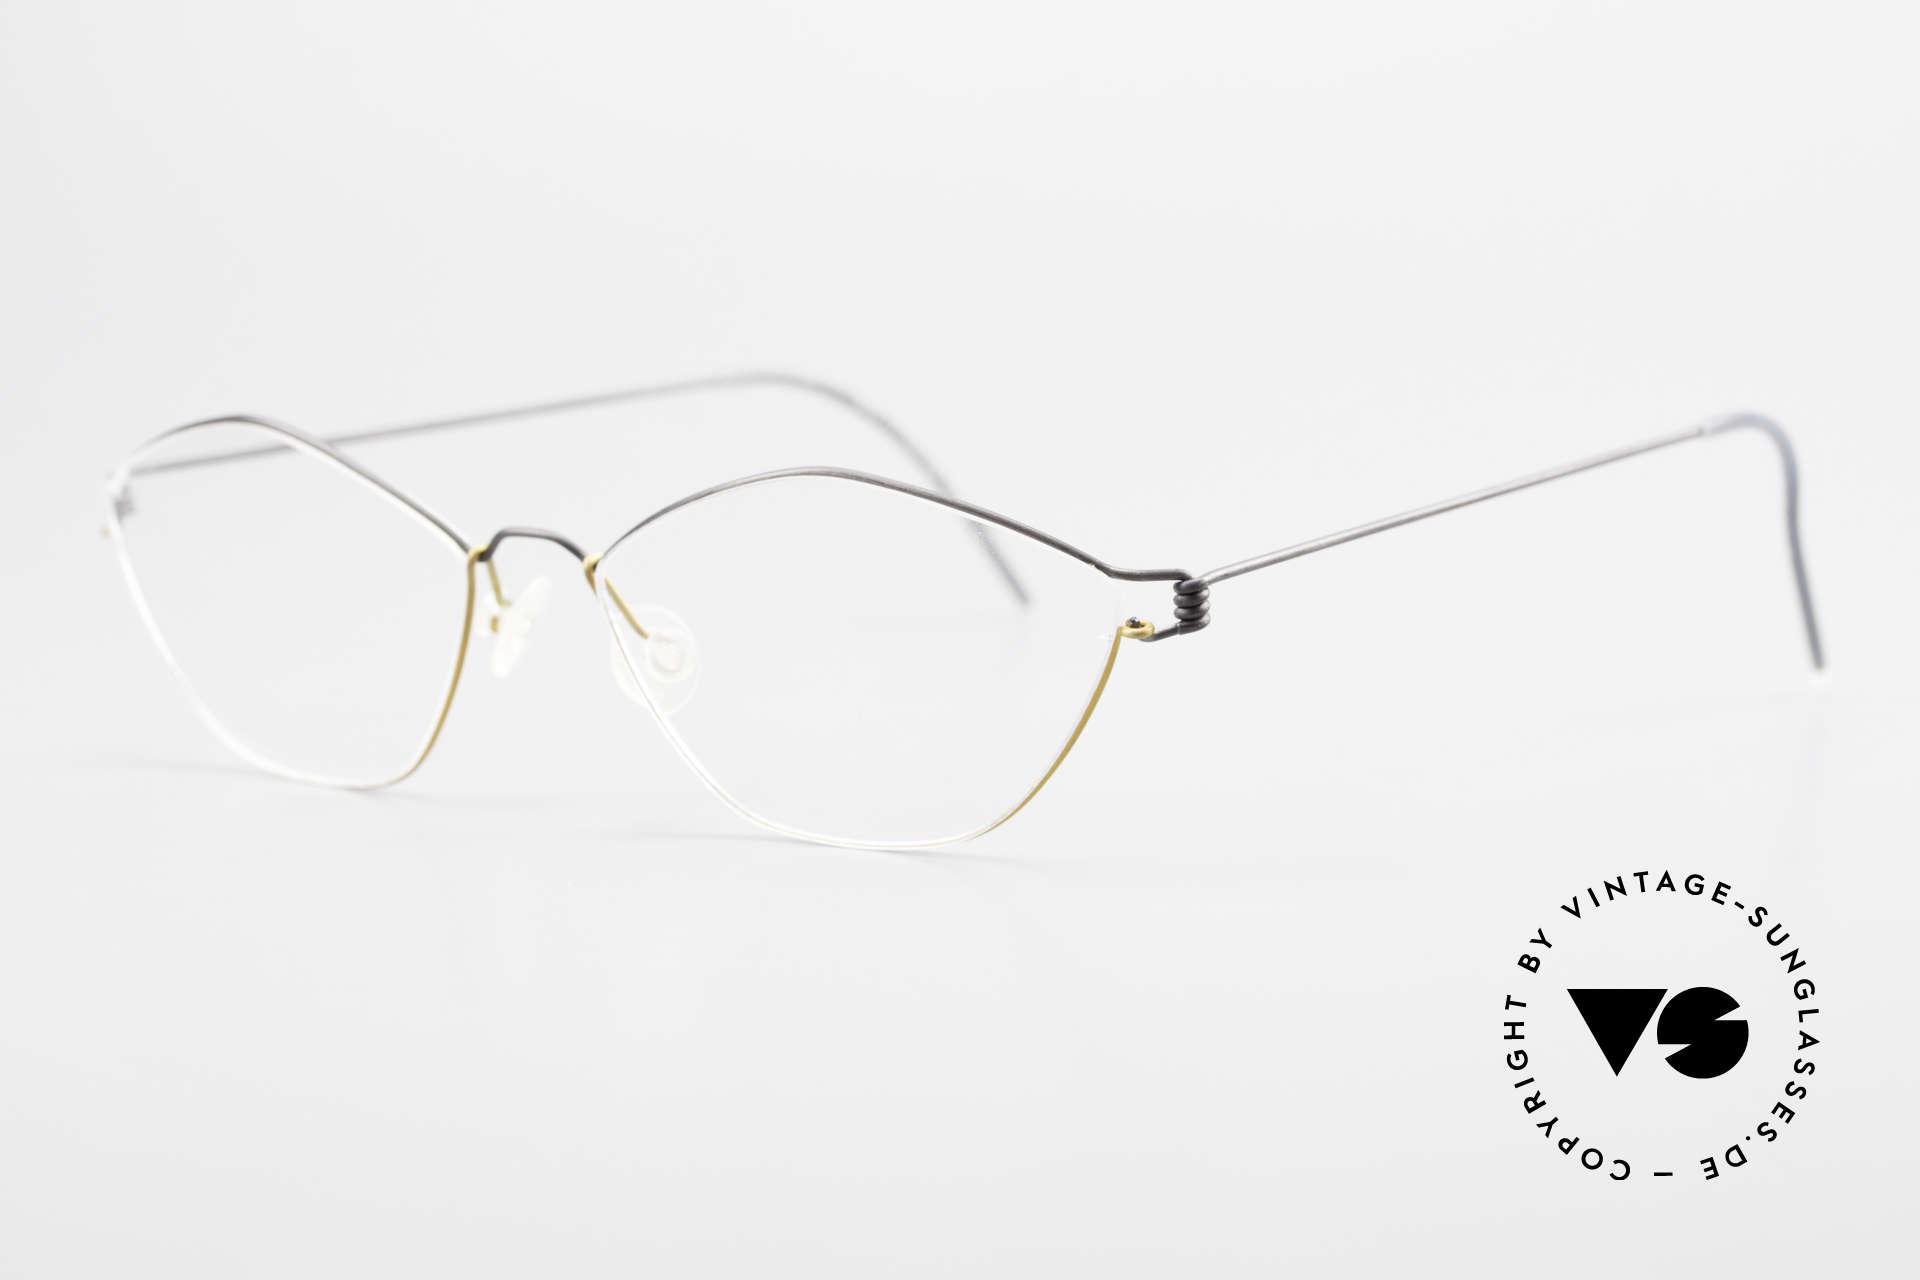 Lindberg Hydra Air Titan Rim Titanium Glasses For Ladies, simply timeless, stylish & innovative: grade 'vintage', Made for Women